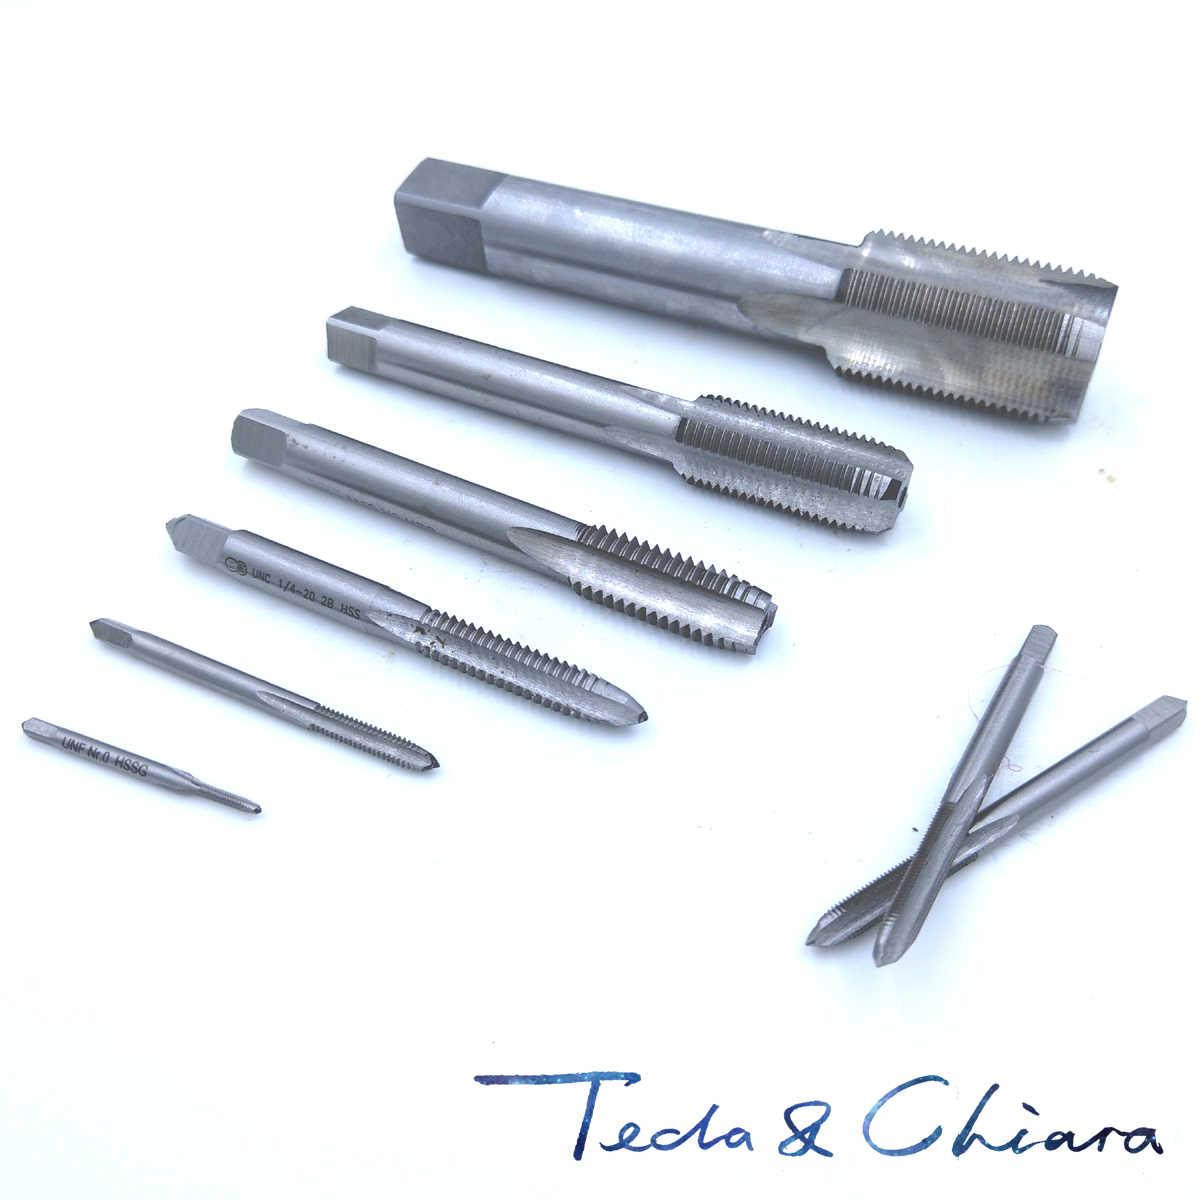 1pc HSS M12 X 1.75mm Plug Left Tap and 1pc M12 X 1.75mm Left Die Threading Tool